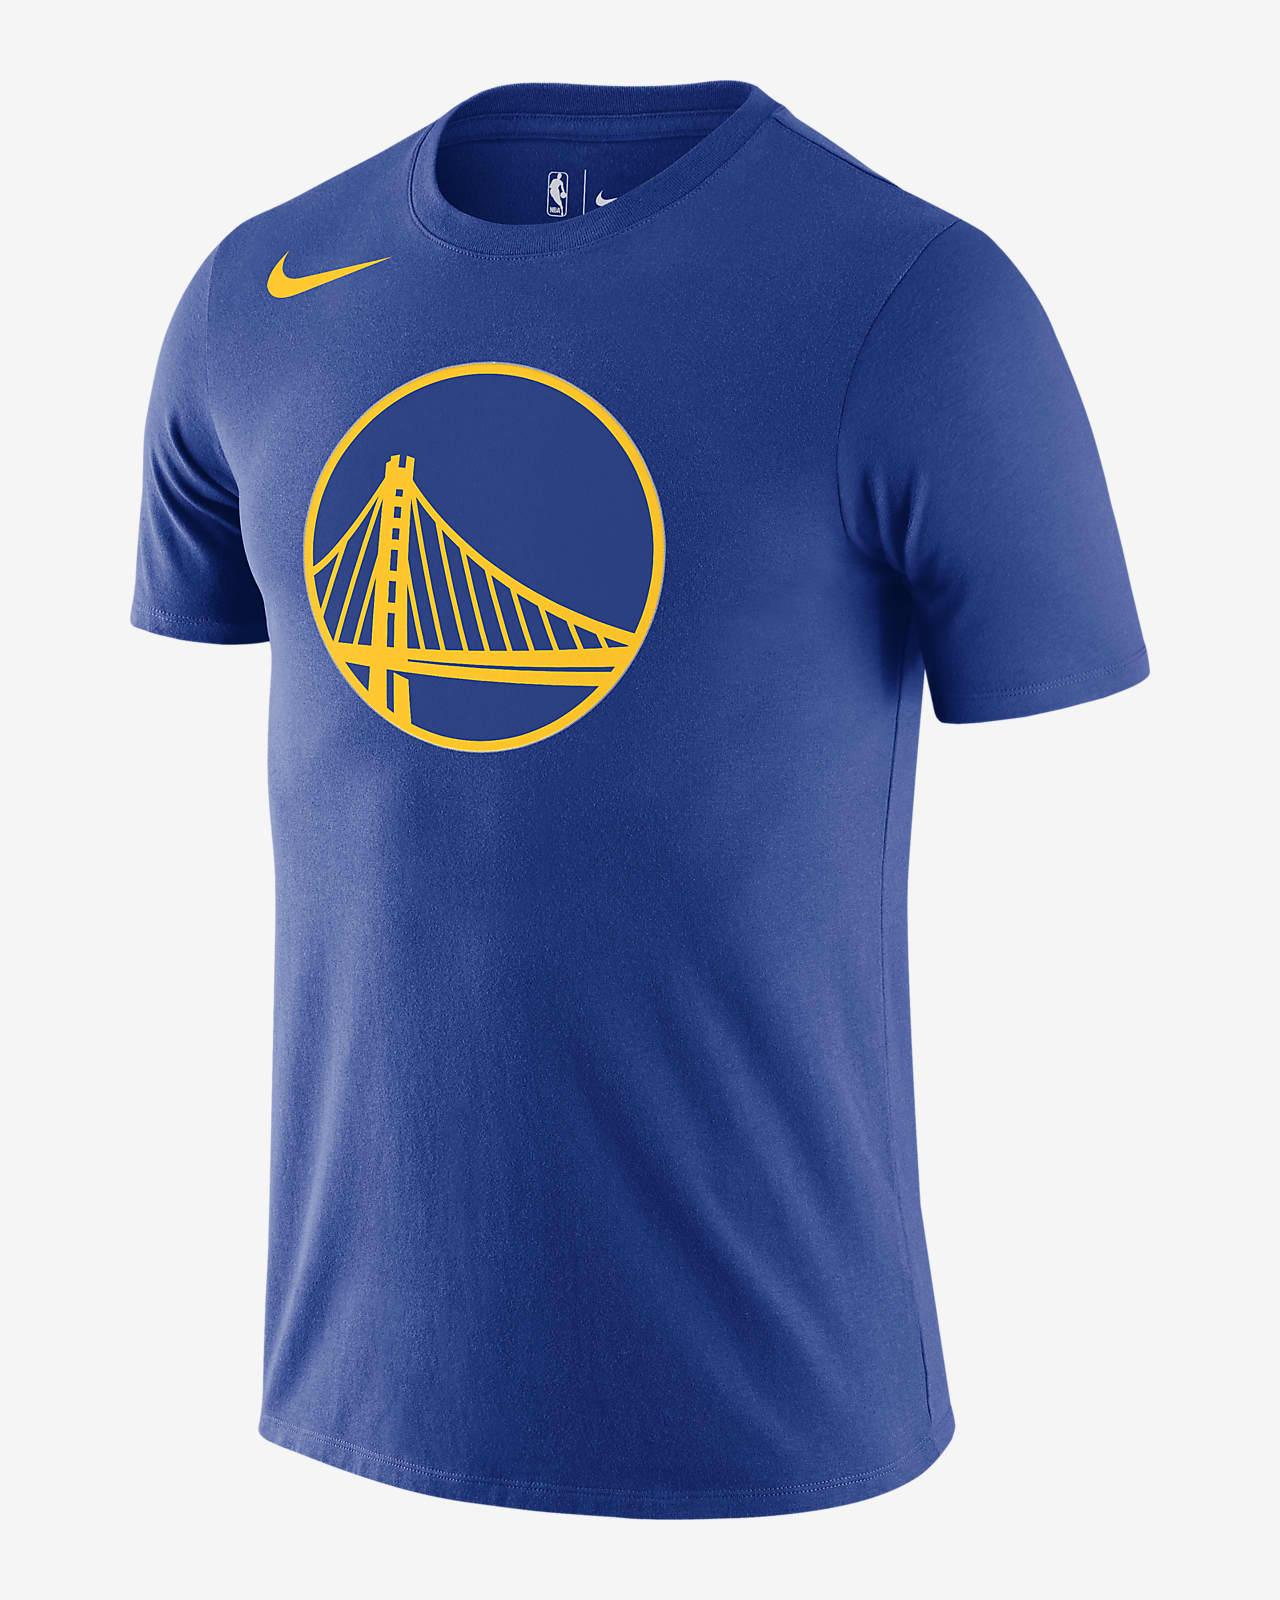 Golden State Warriors Nike NBA-herenshirt met logo en Dri-FIT